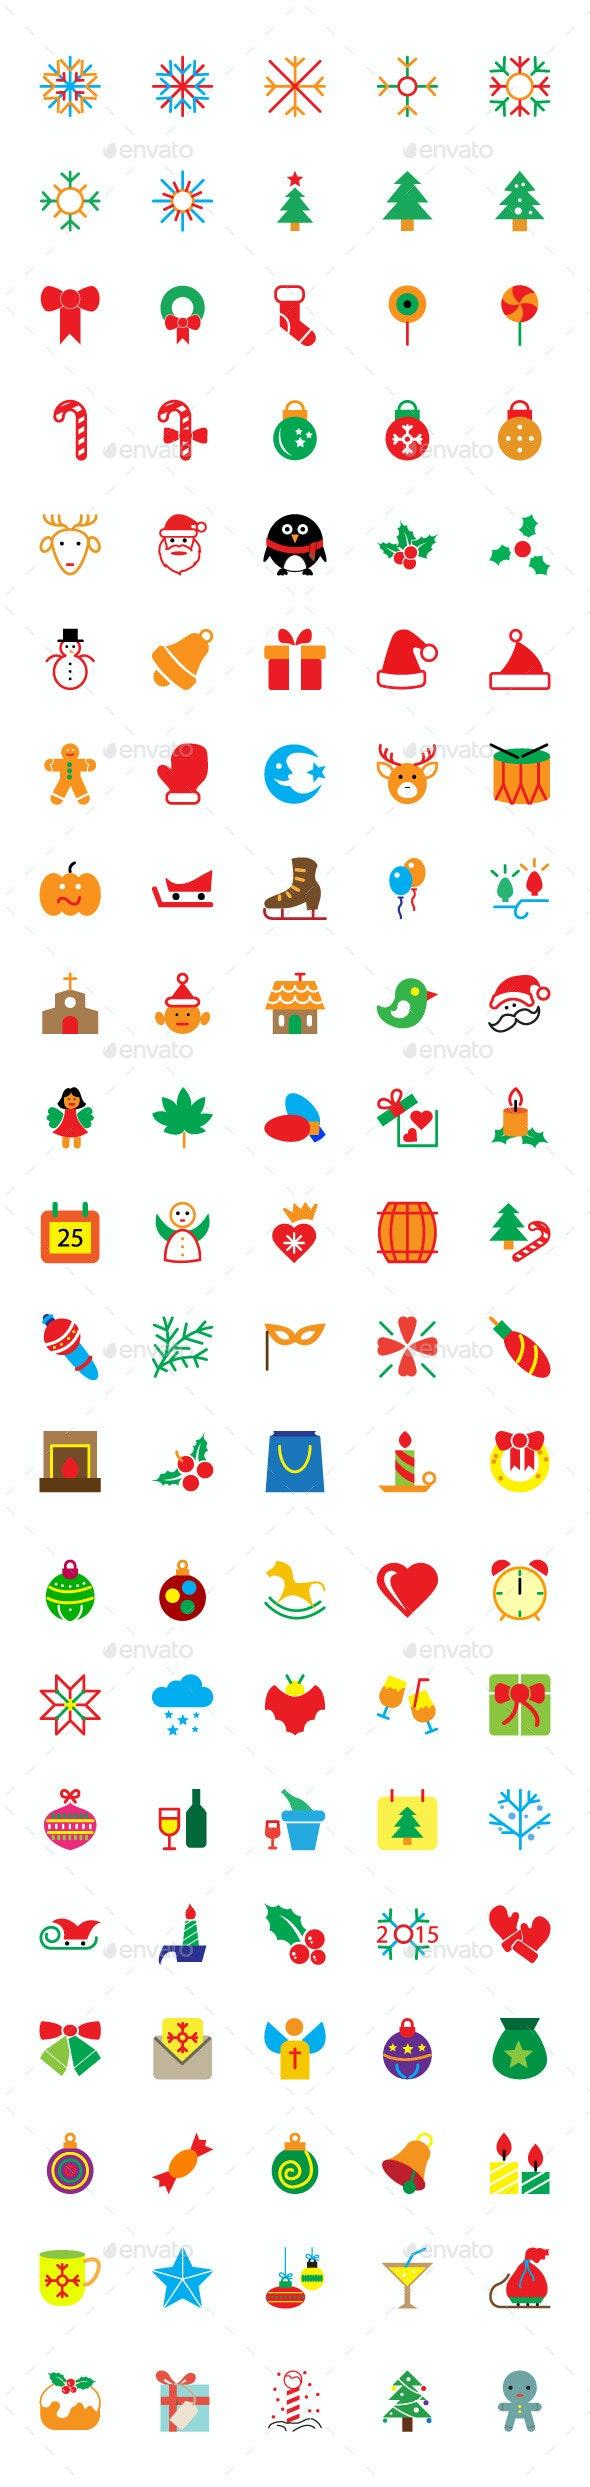 100+ Colored Merry Christmas Vector Icons - Seasonal Icons